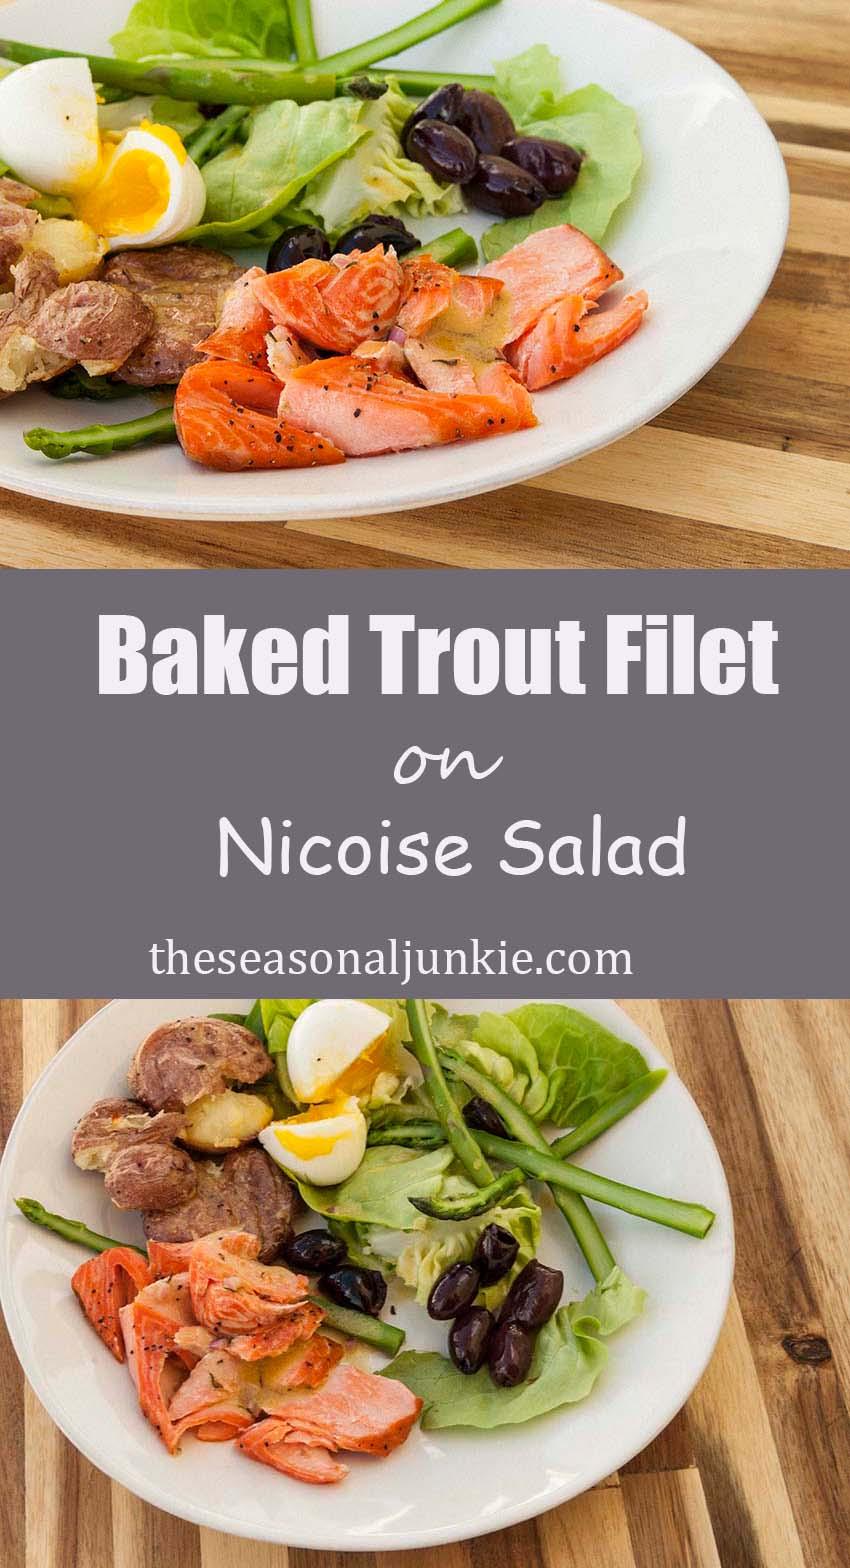 Baked Trout Filet on Nicoise Salad - The Seasonal Junkie